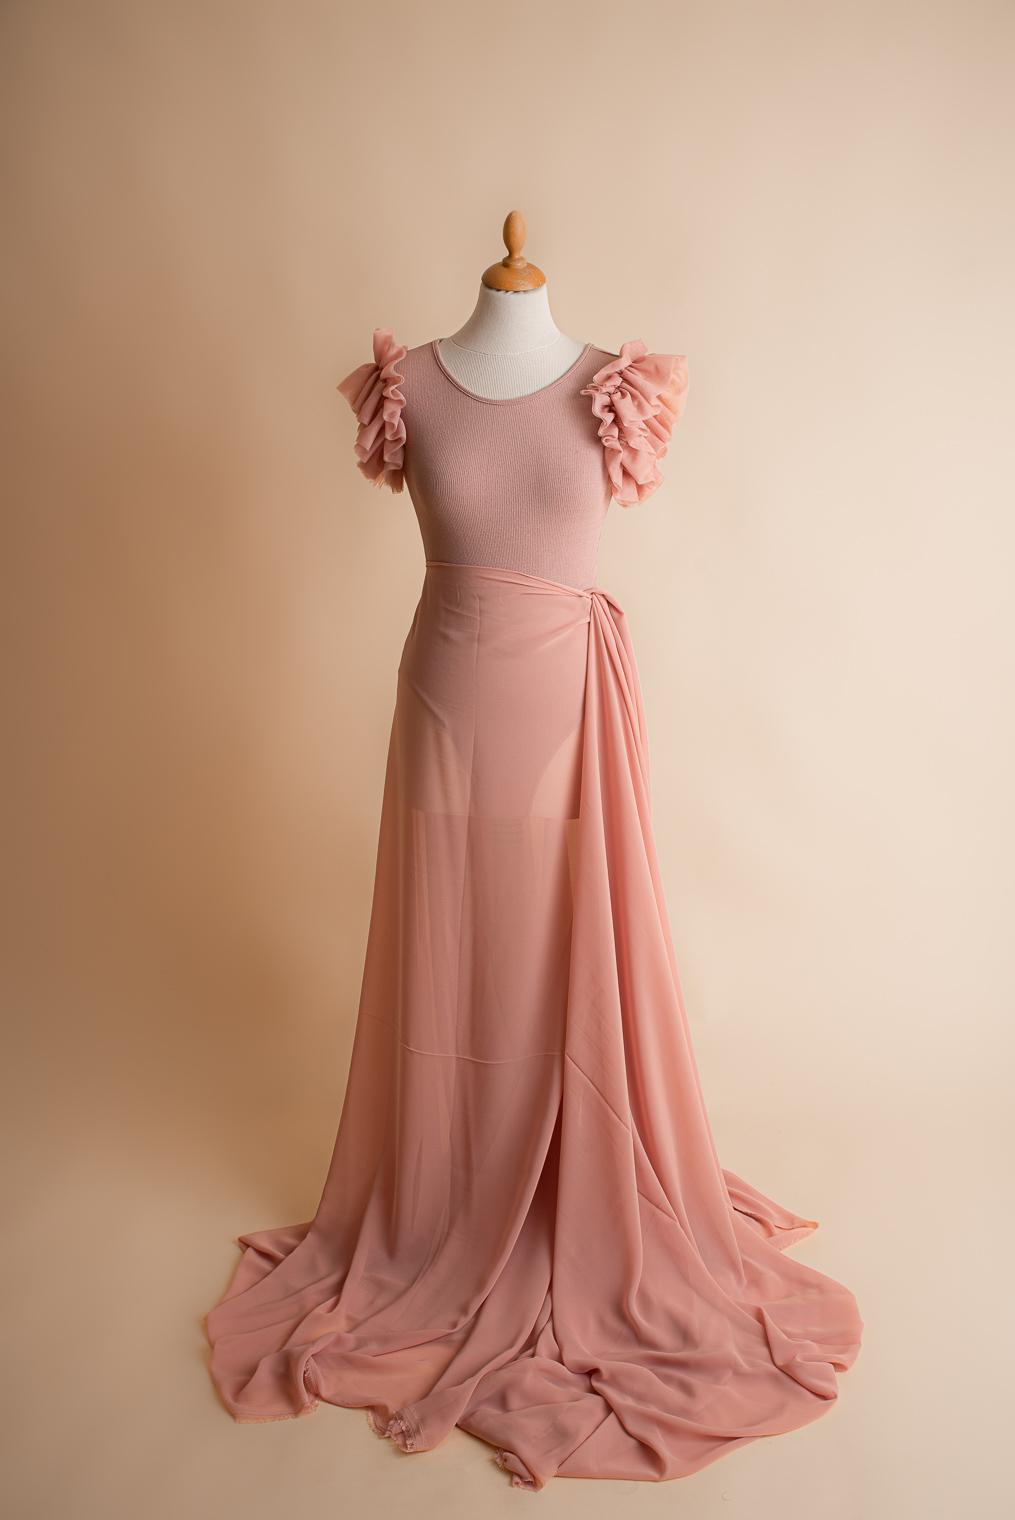 Tenues-Robes-Femme-Enceinte-Grossesse-Maman-Belinda-Lopez-Photographie-belindalopez.fr-33